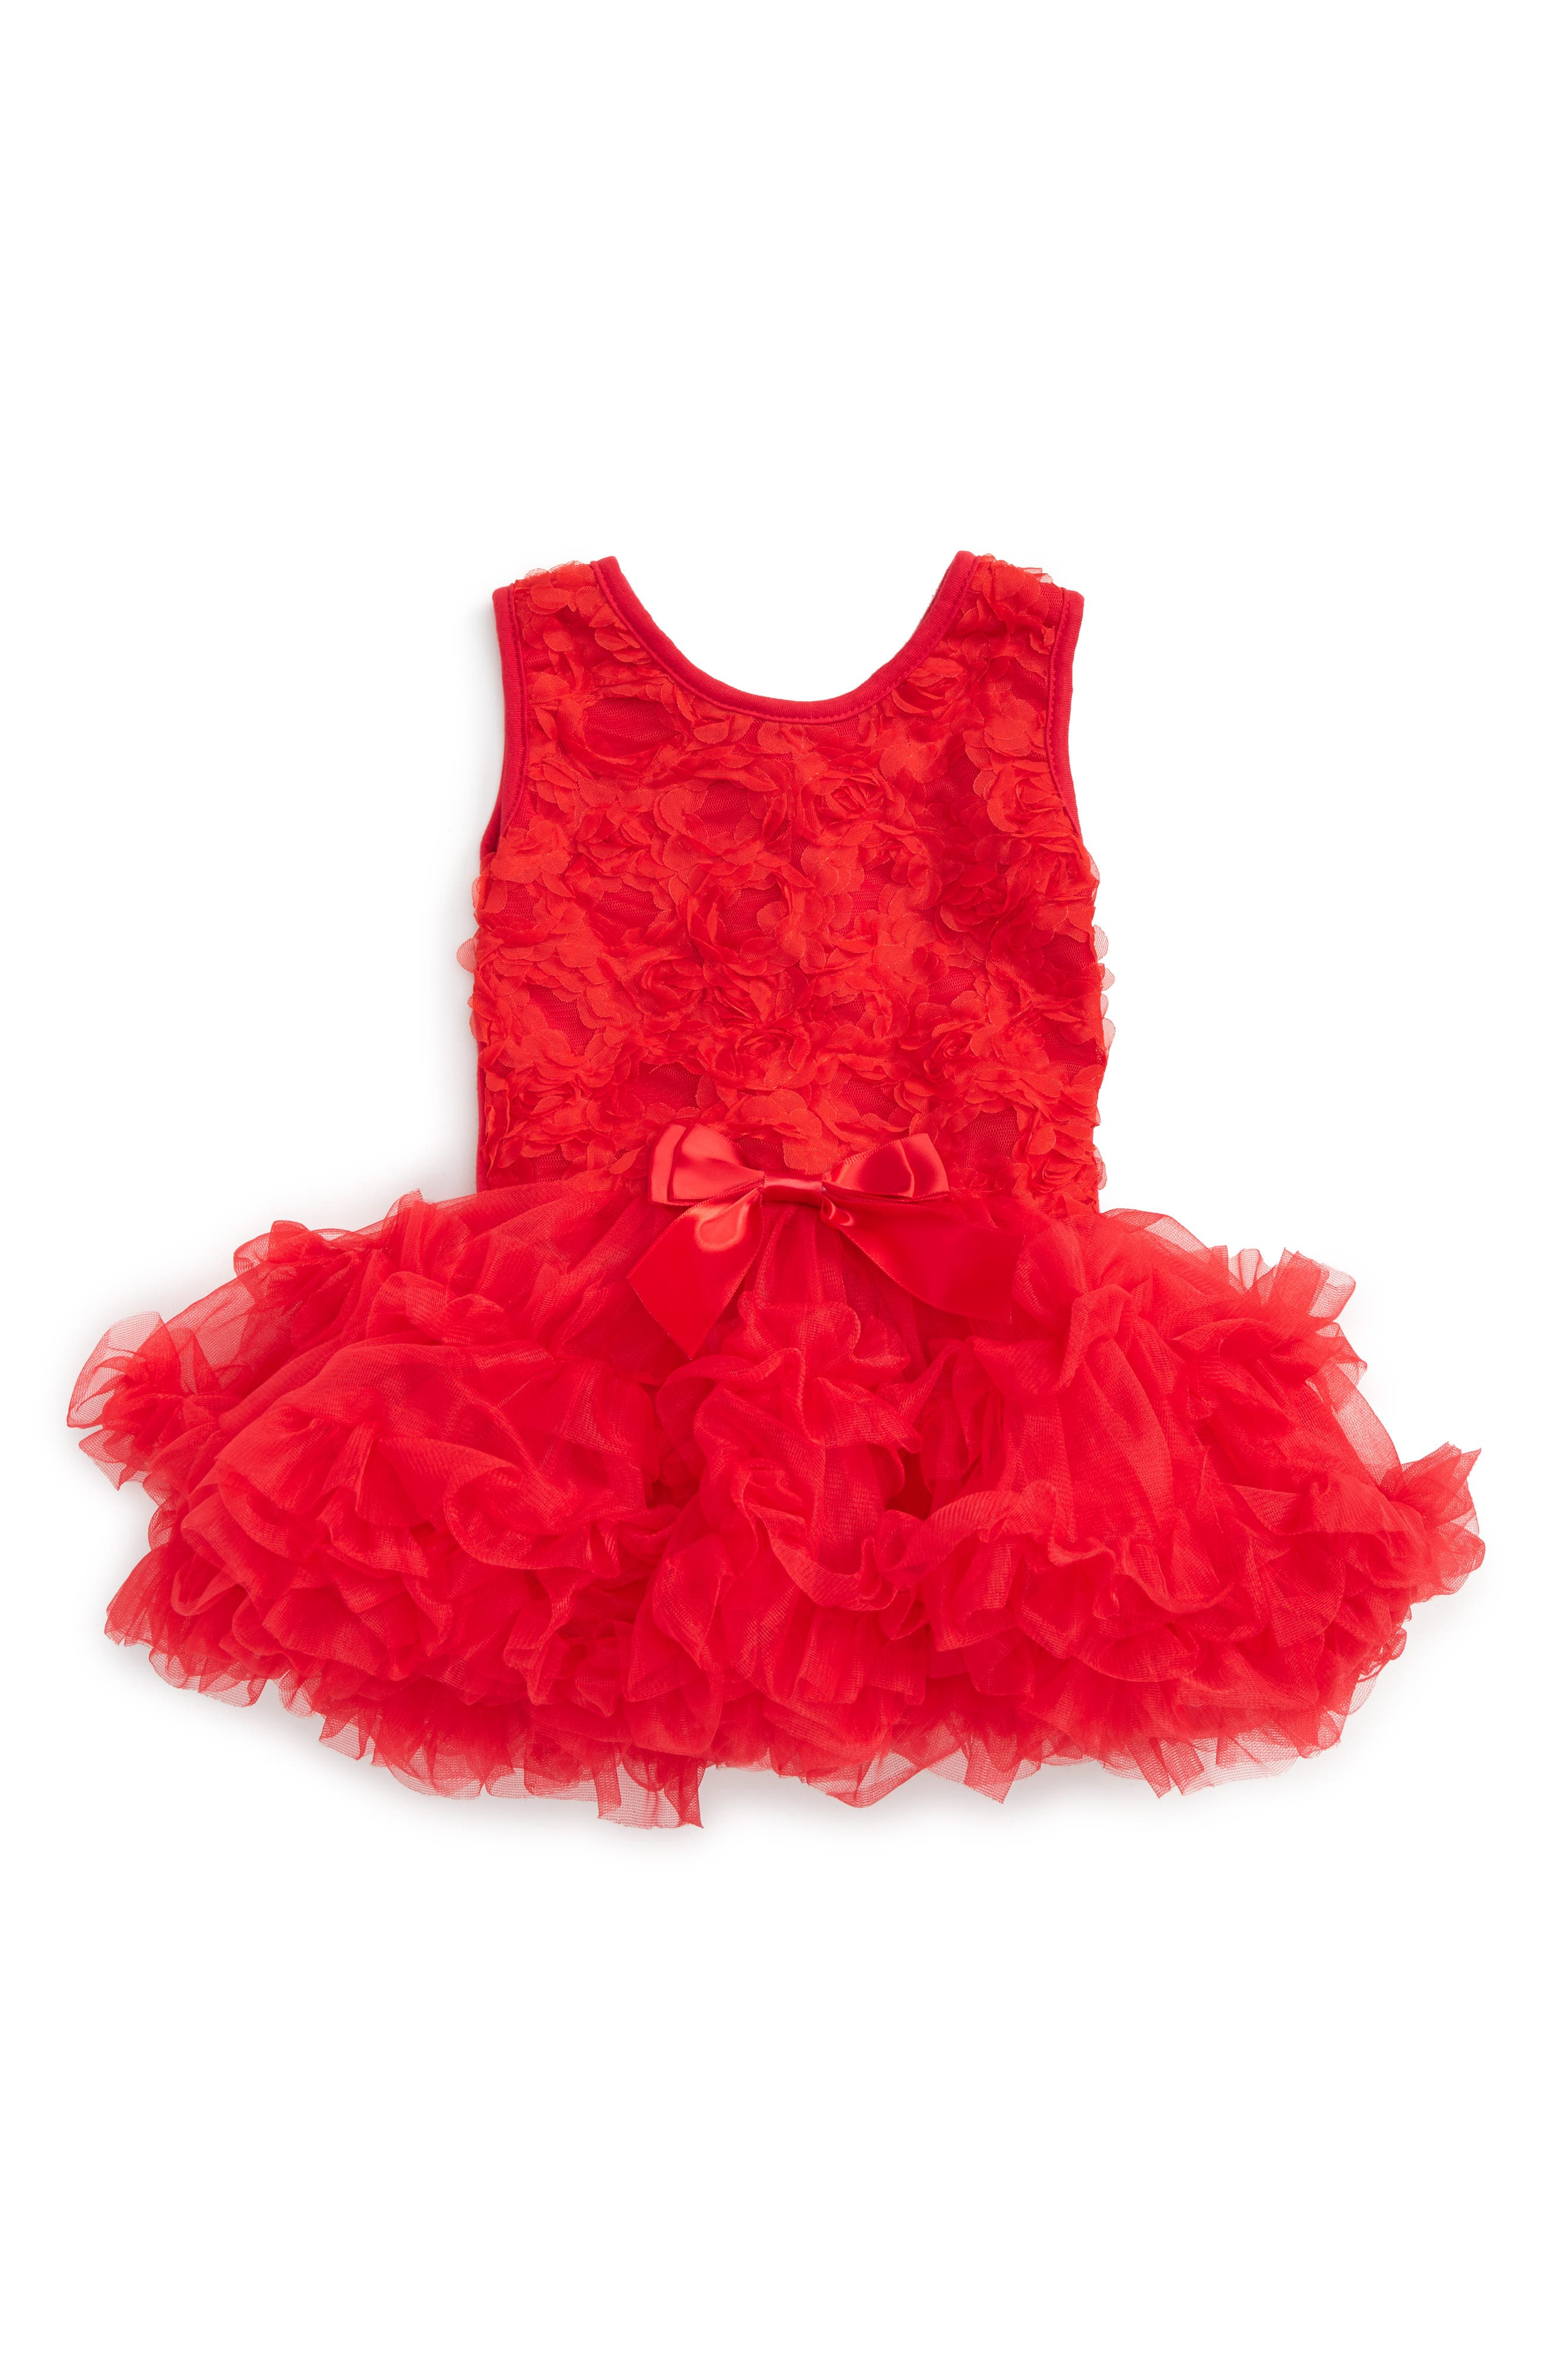 Rosette Tutu Dress,                         Main,                         color, Red